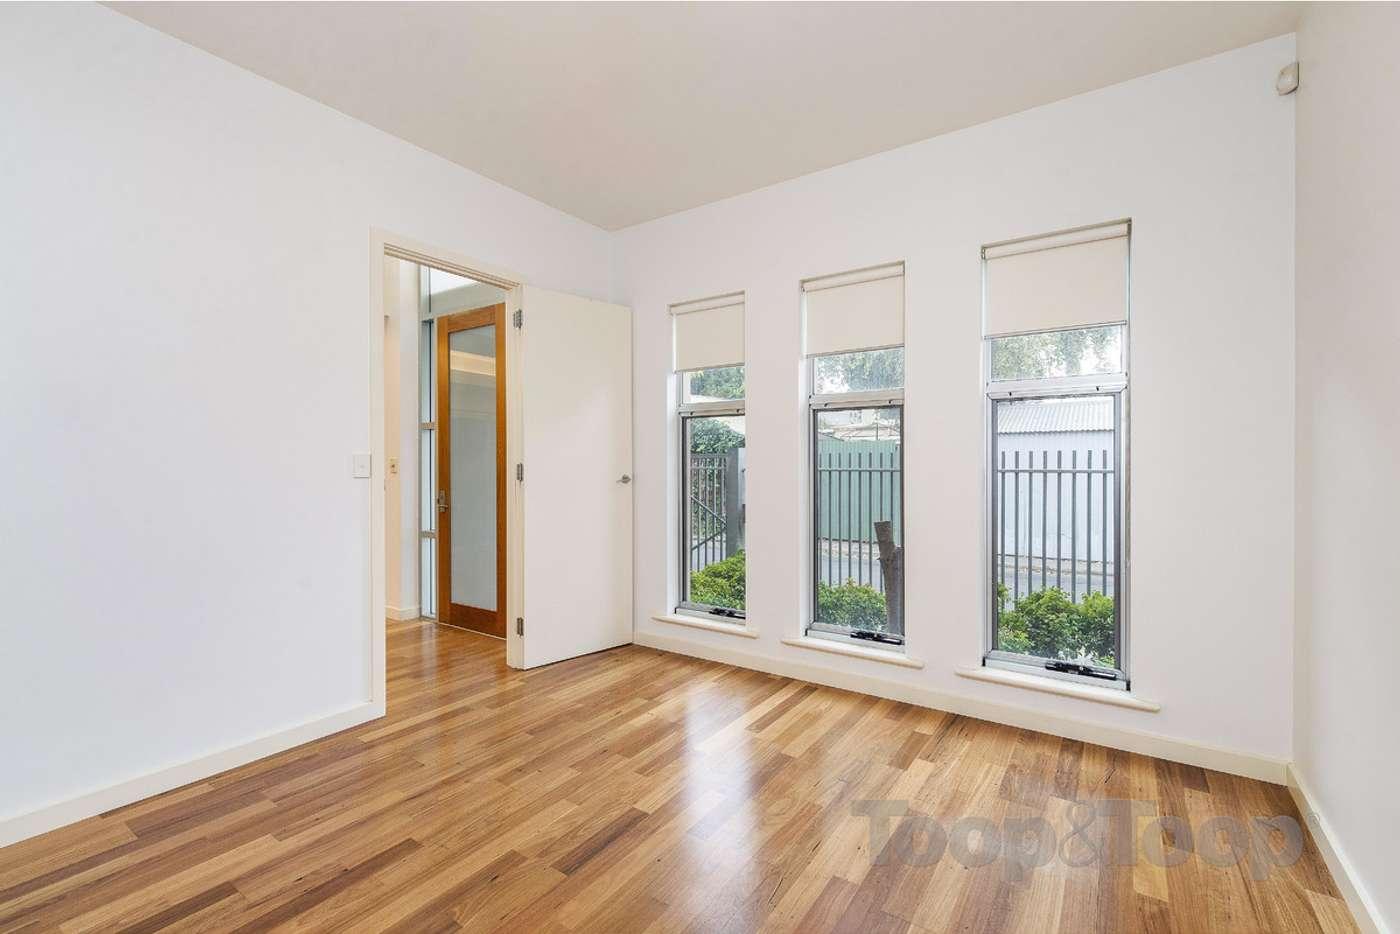 Sixth view of Homely house listing, 3 Eitzen Street, Glenelg SA 5045